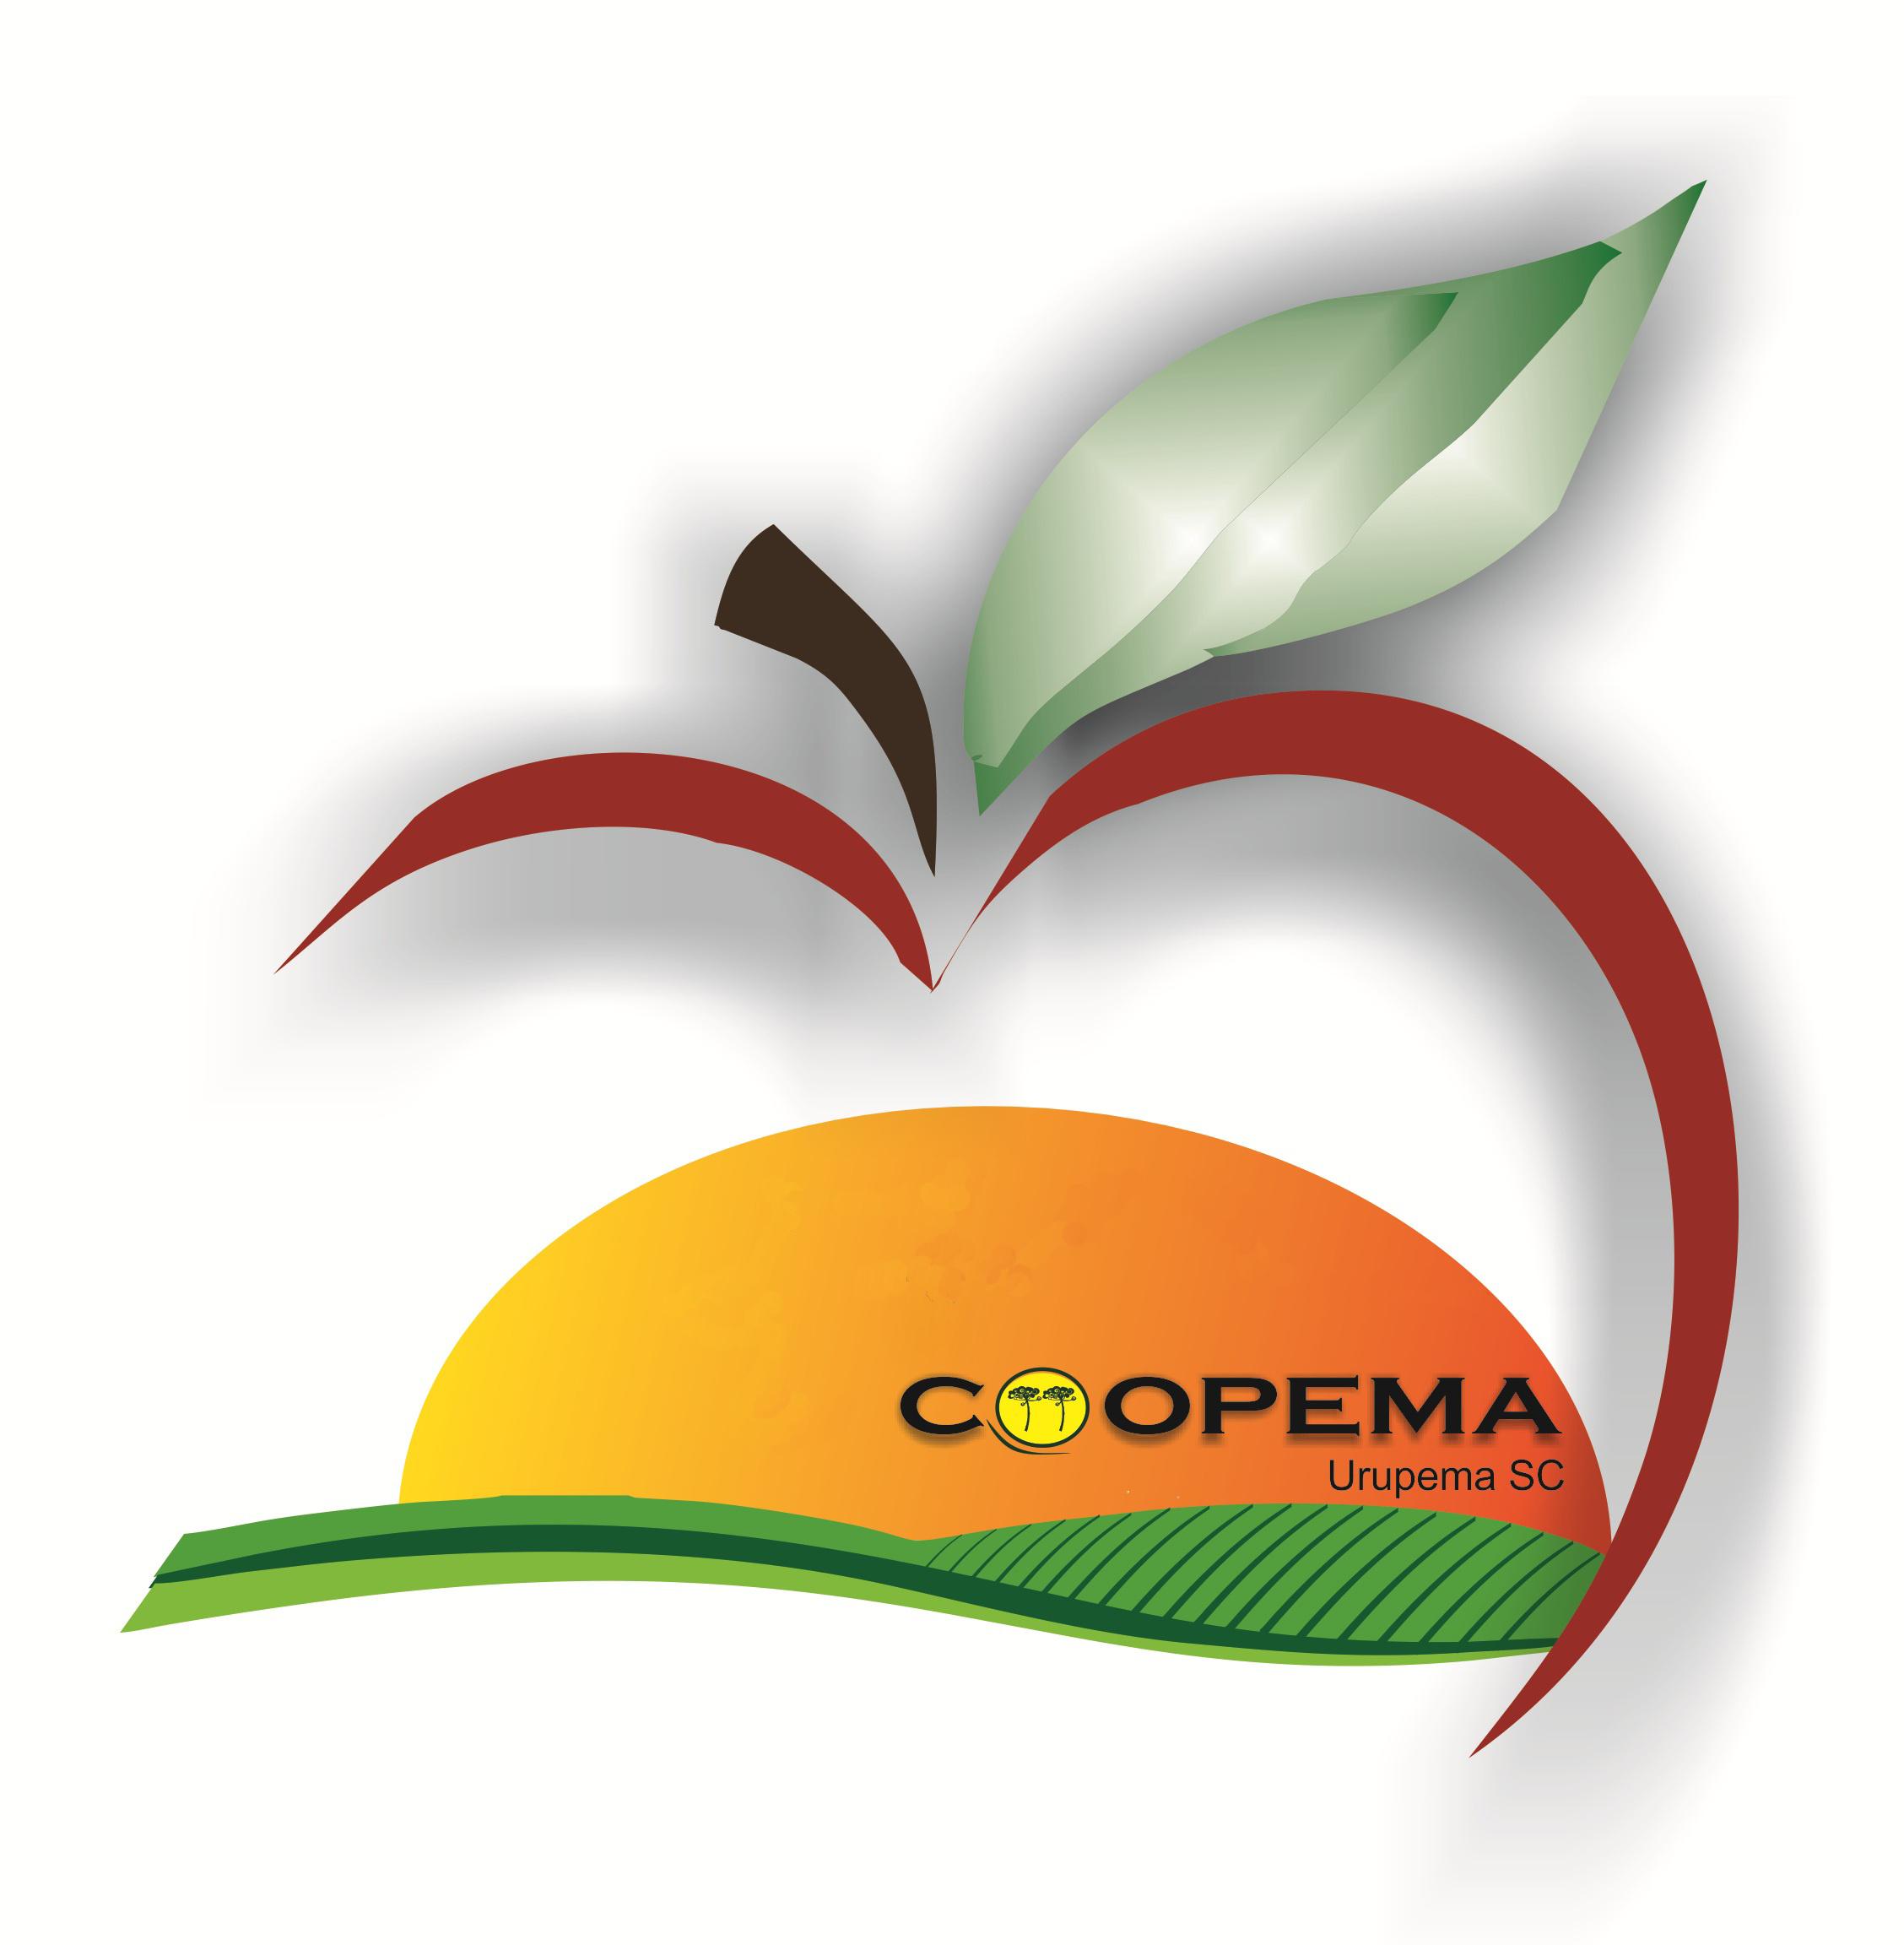 COOPEMA Cooperativa Urupema